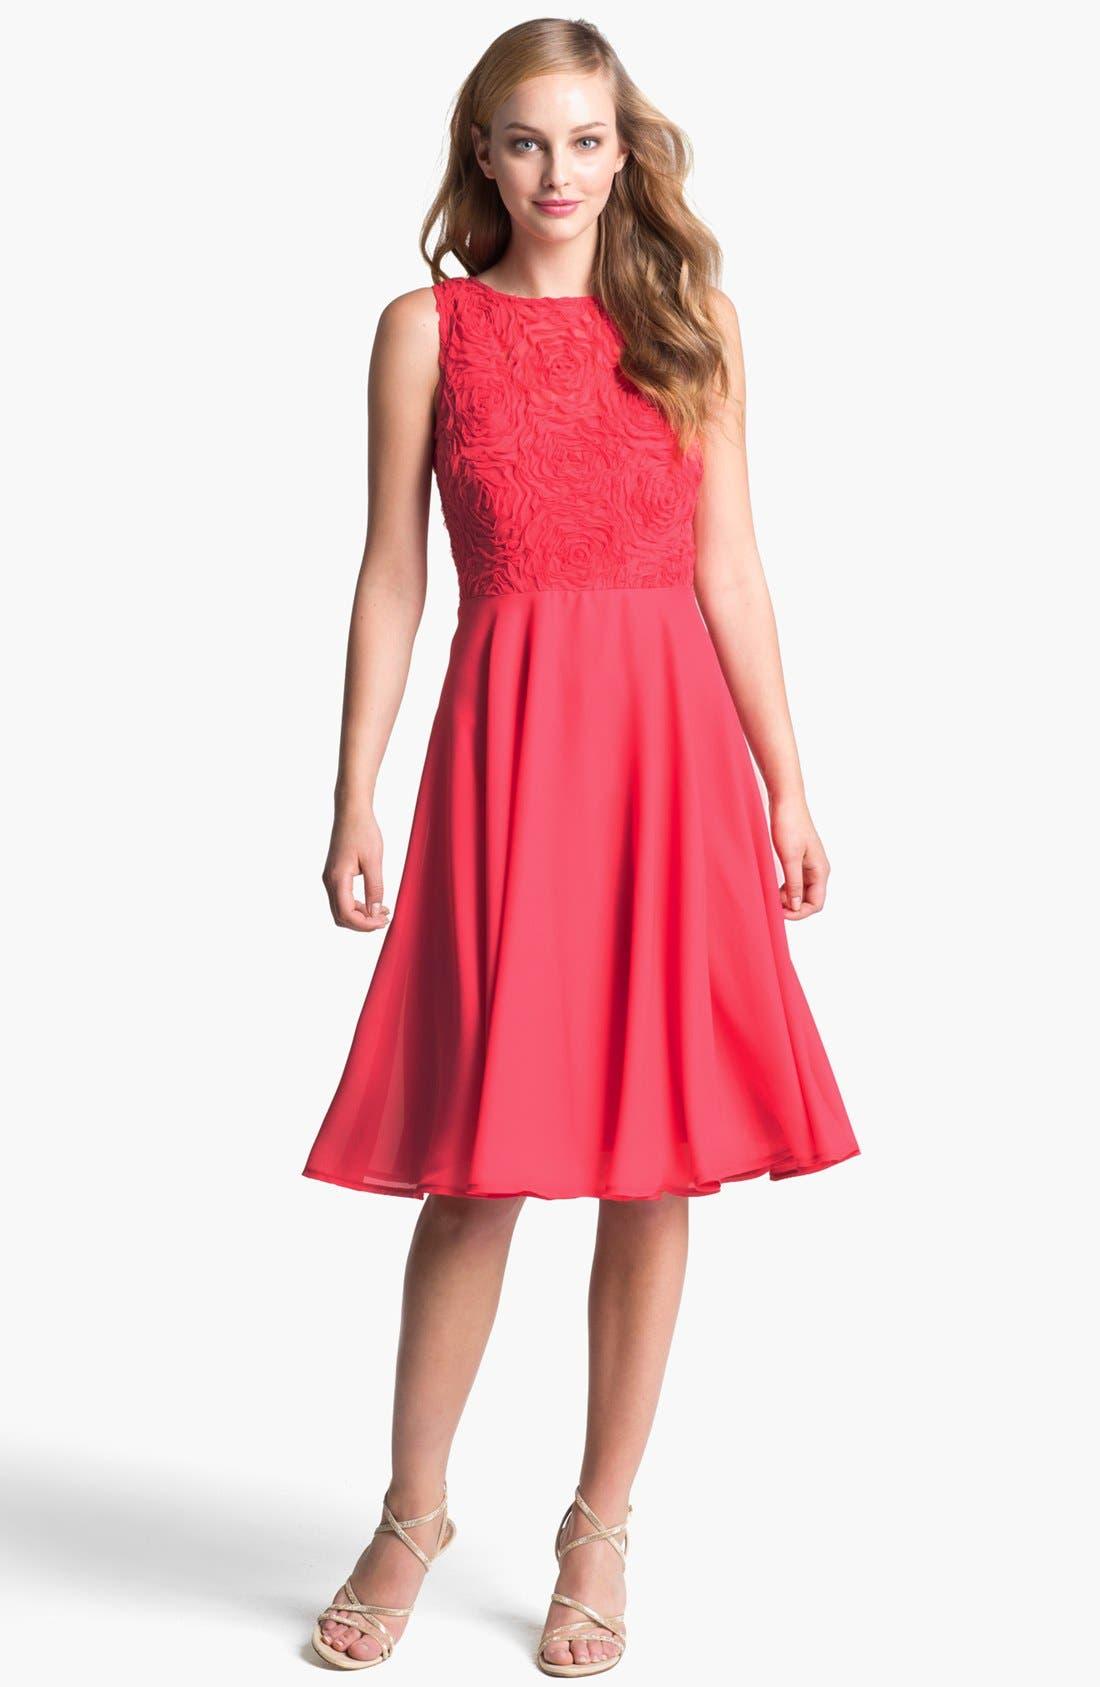 Alternate Image 1 Selected - Isaac Mizrahi New York Soutache Fit & Flare Dress